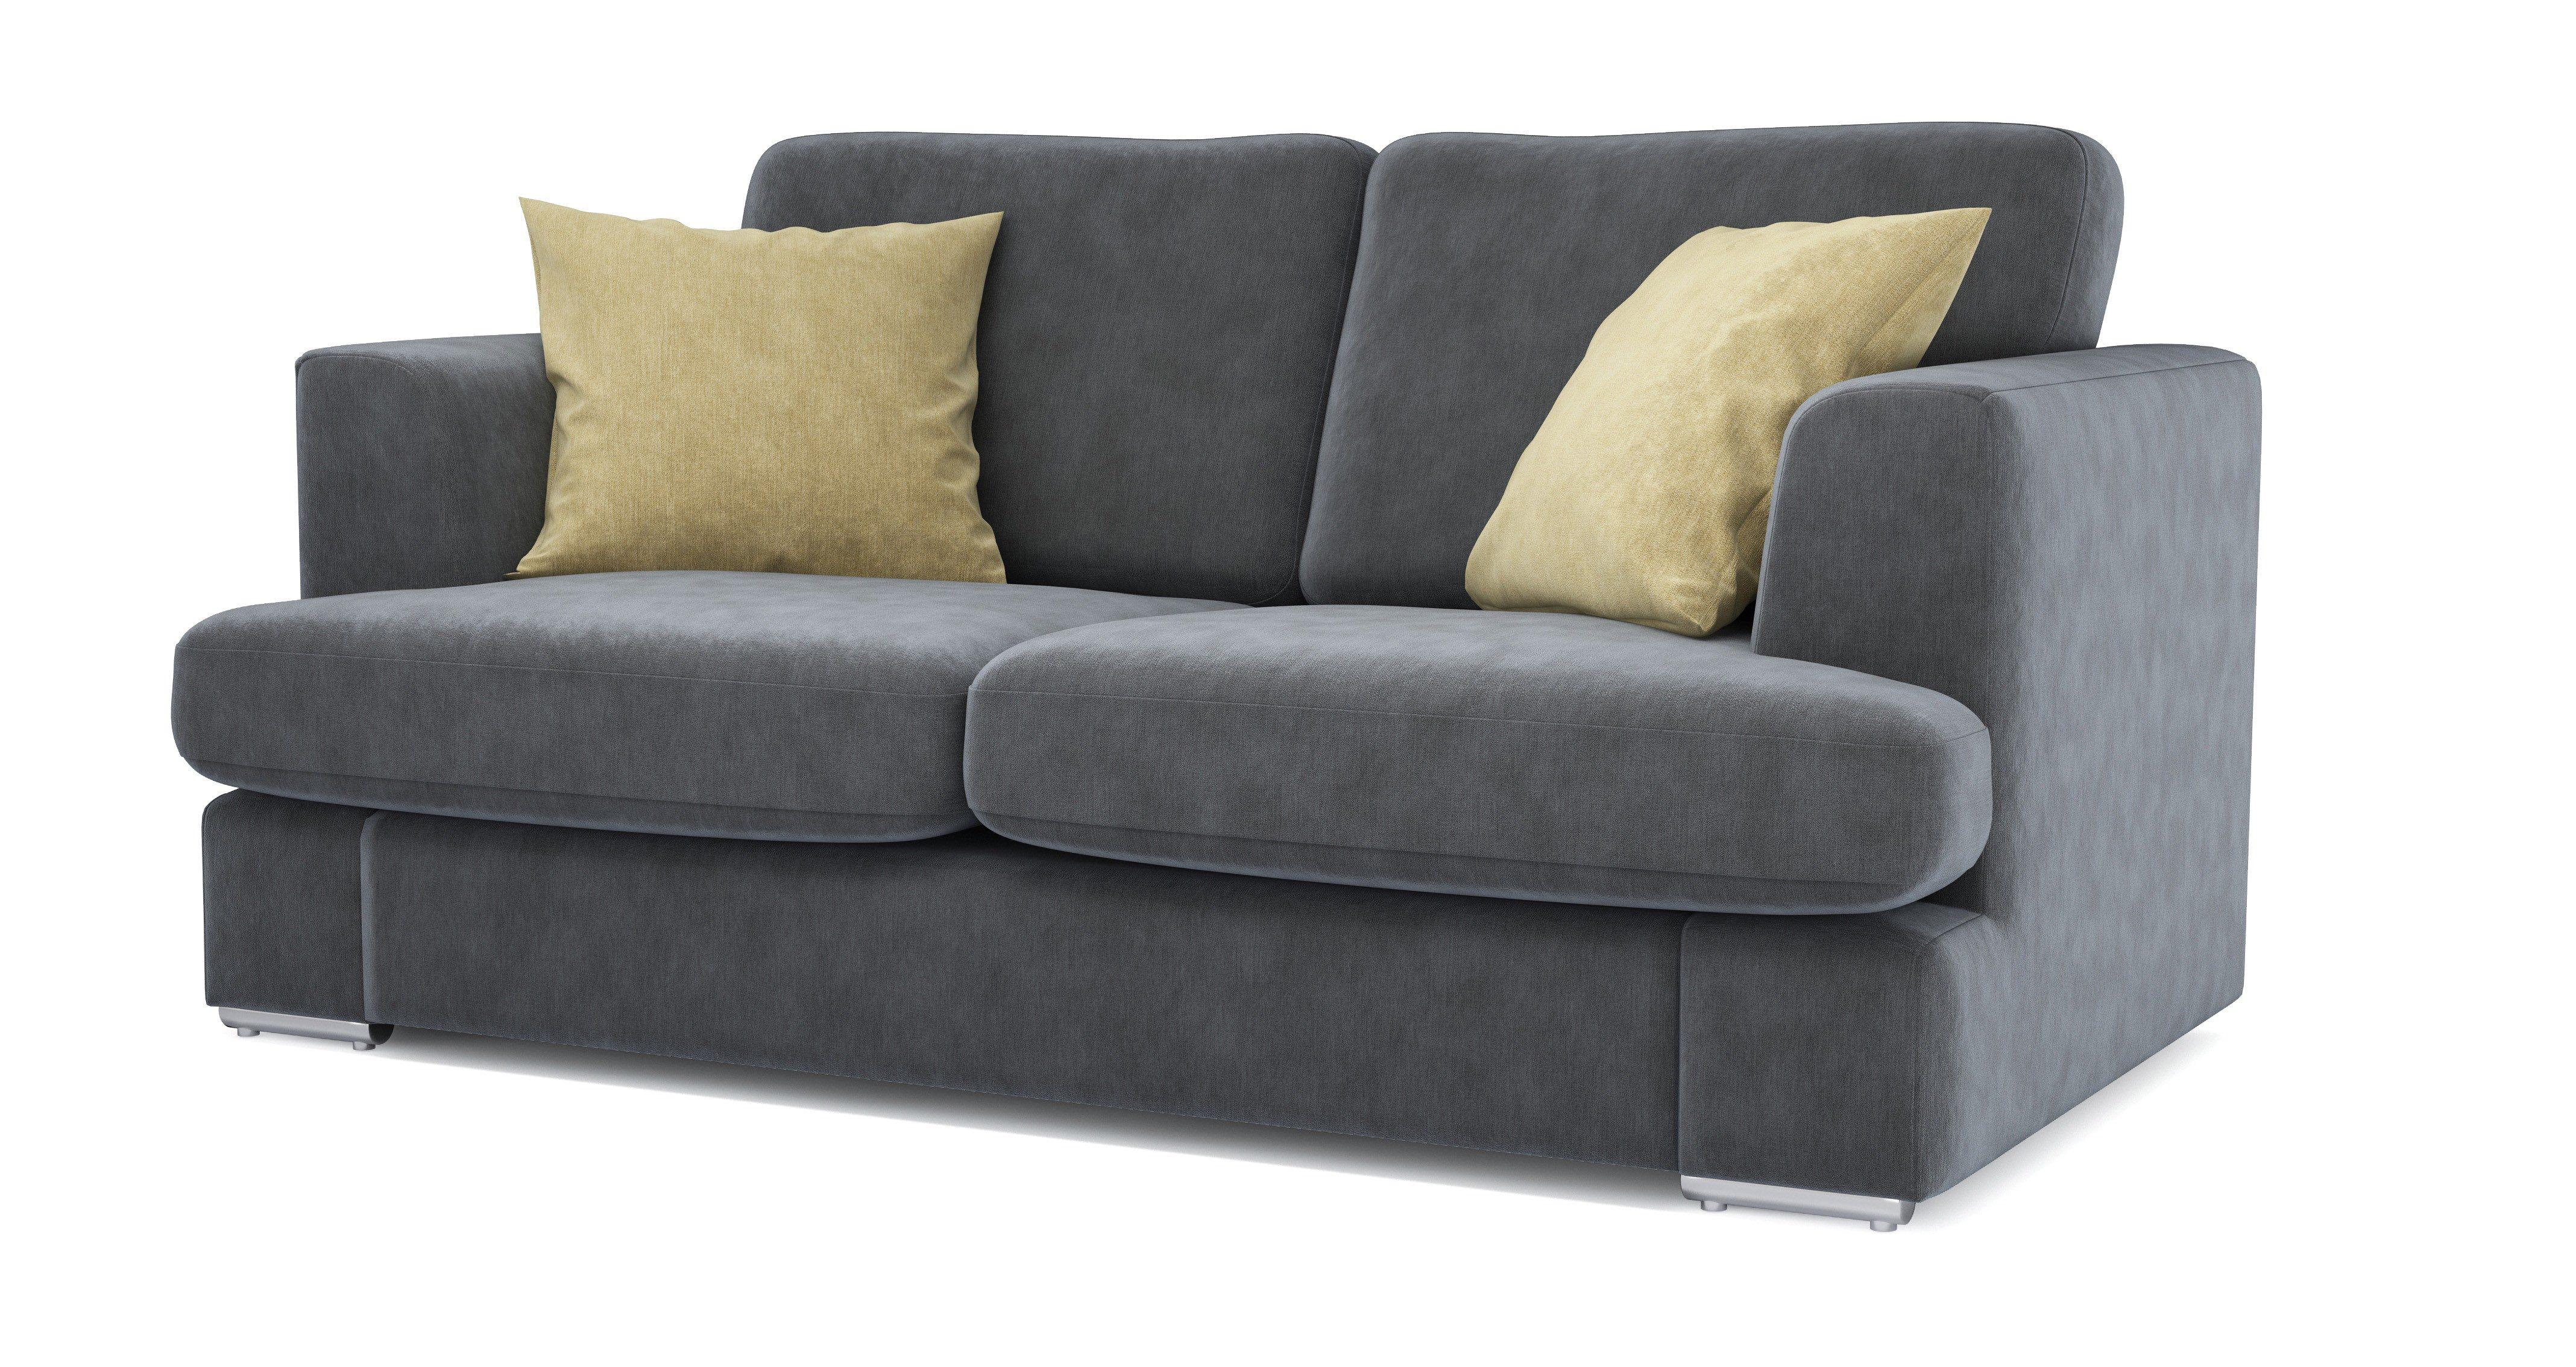 dfs sofas 2 seater new york futon sofa bed two 28 images sophia leather